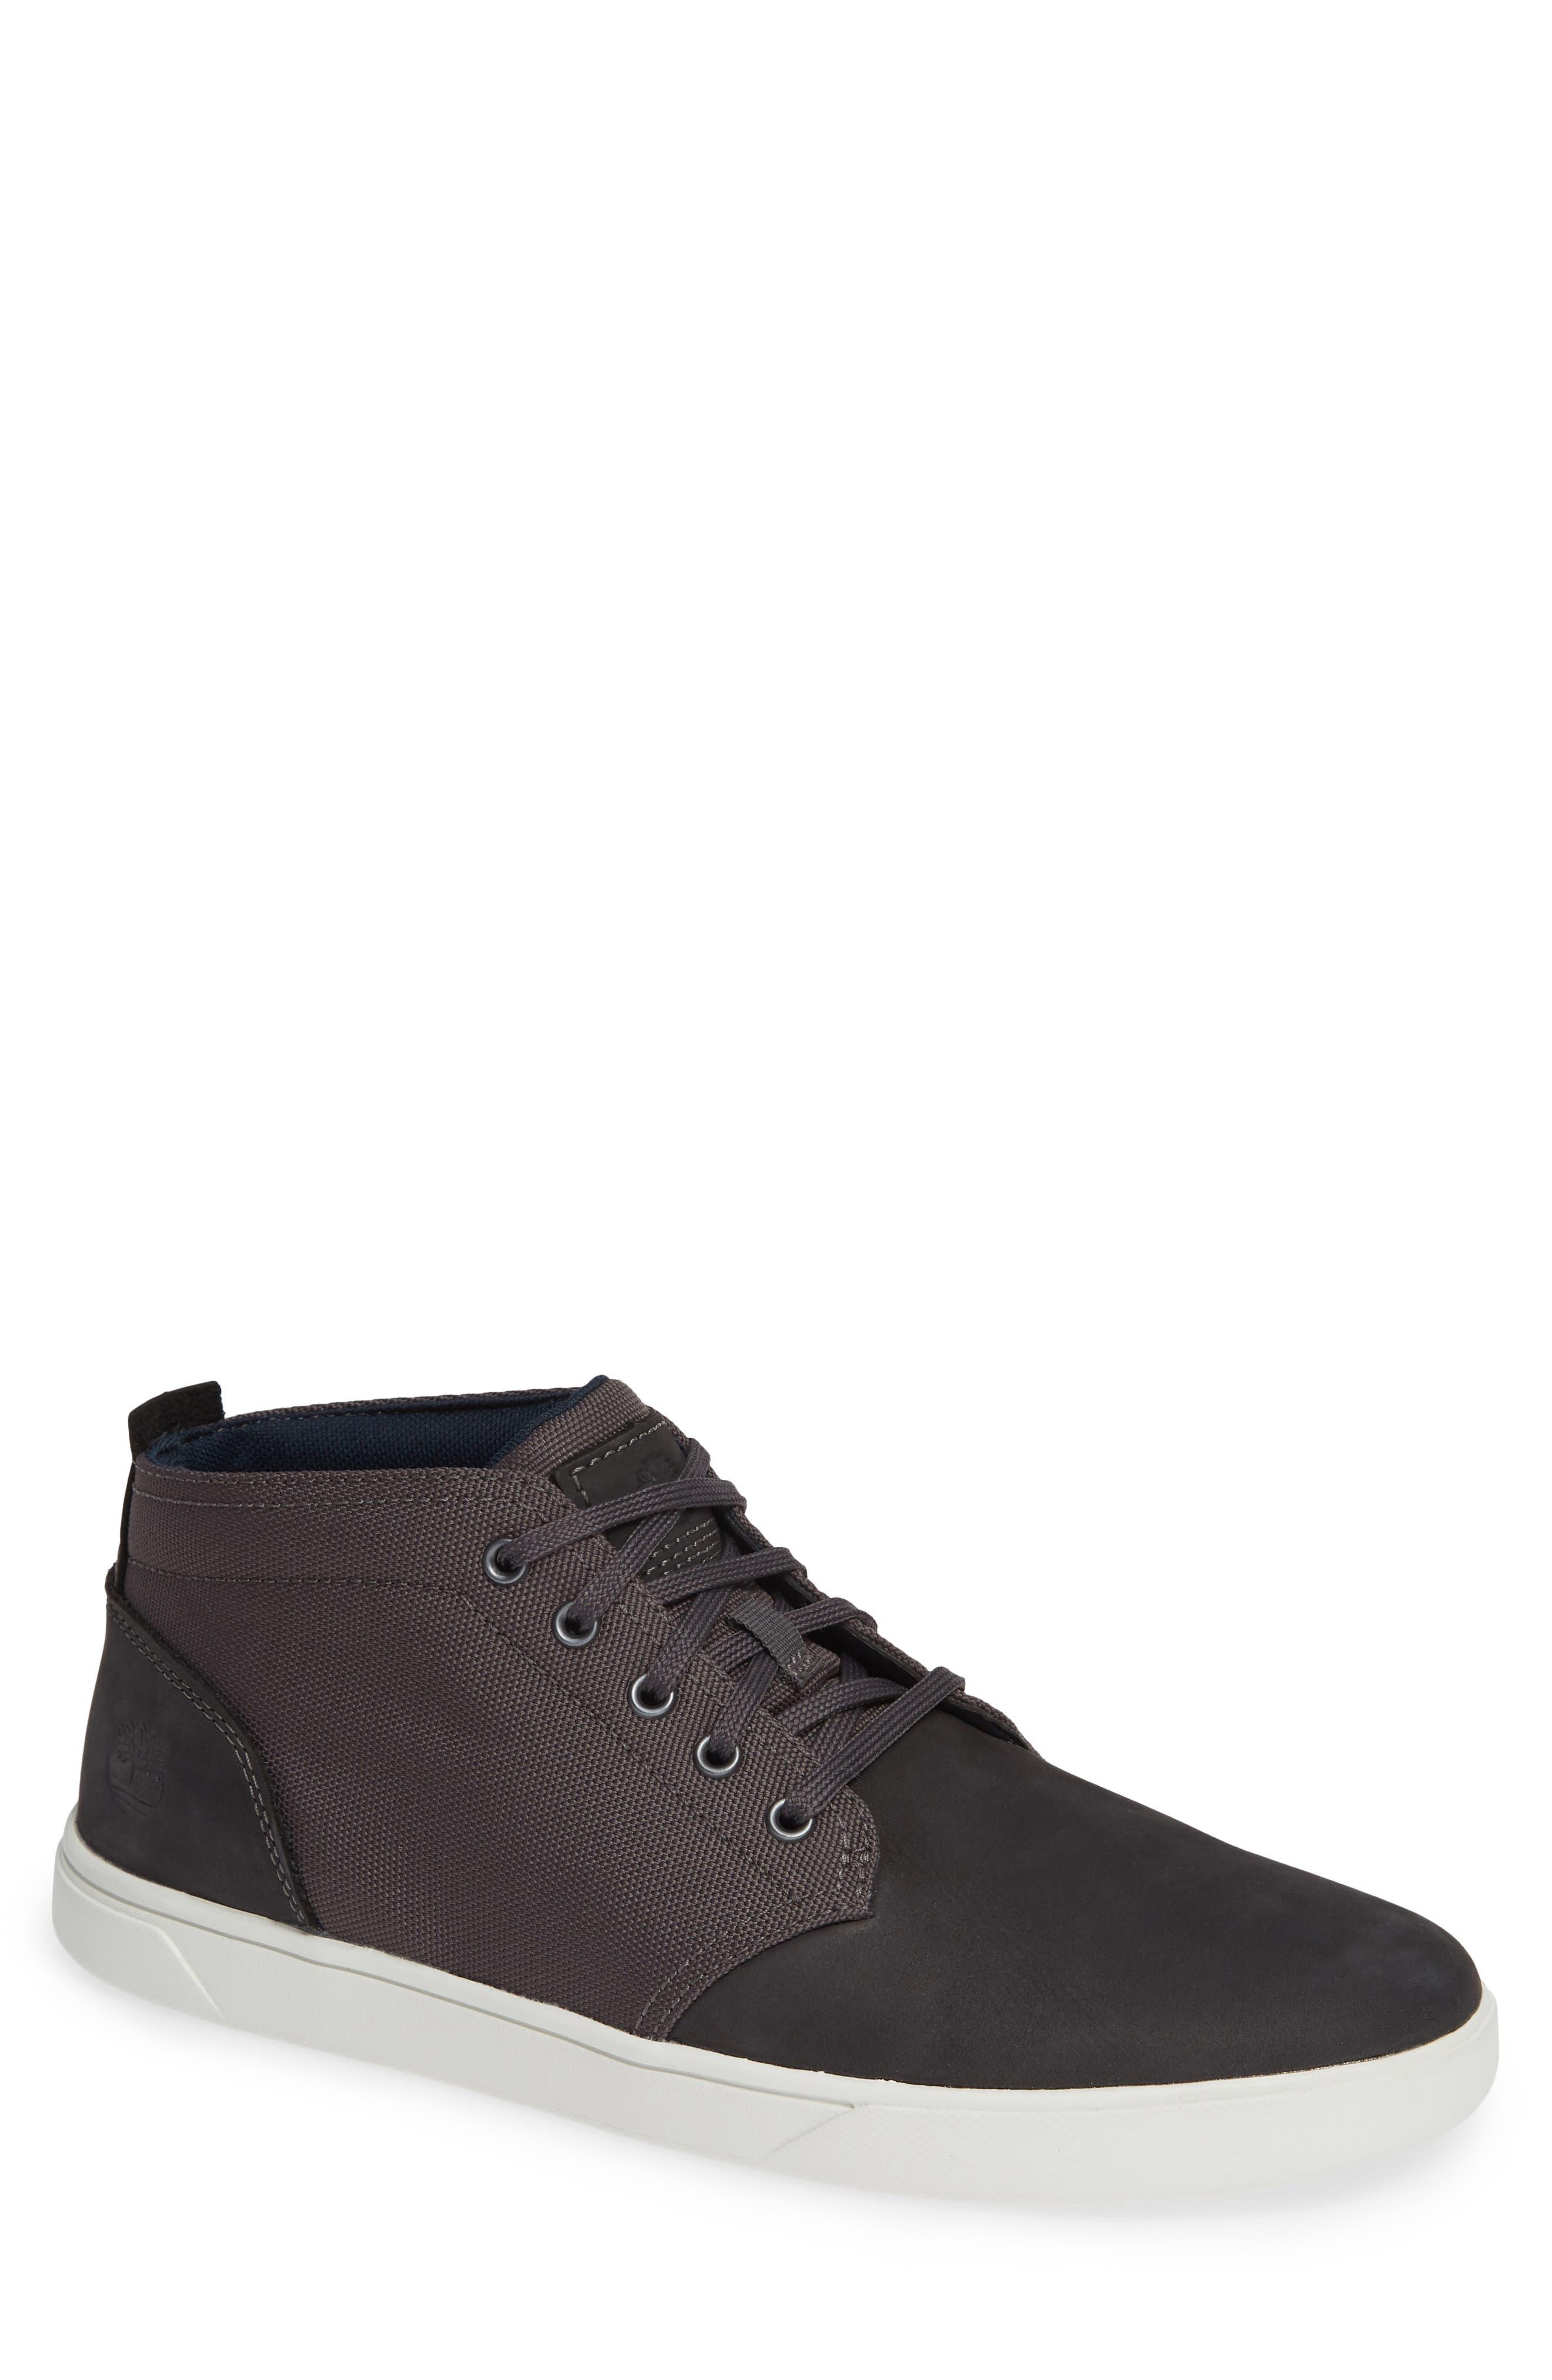 Earthkeepers<sup>®</sup> 'Groveton' Chukka Sneaker,                         Main,                         color, CHARCOAL